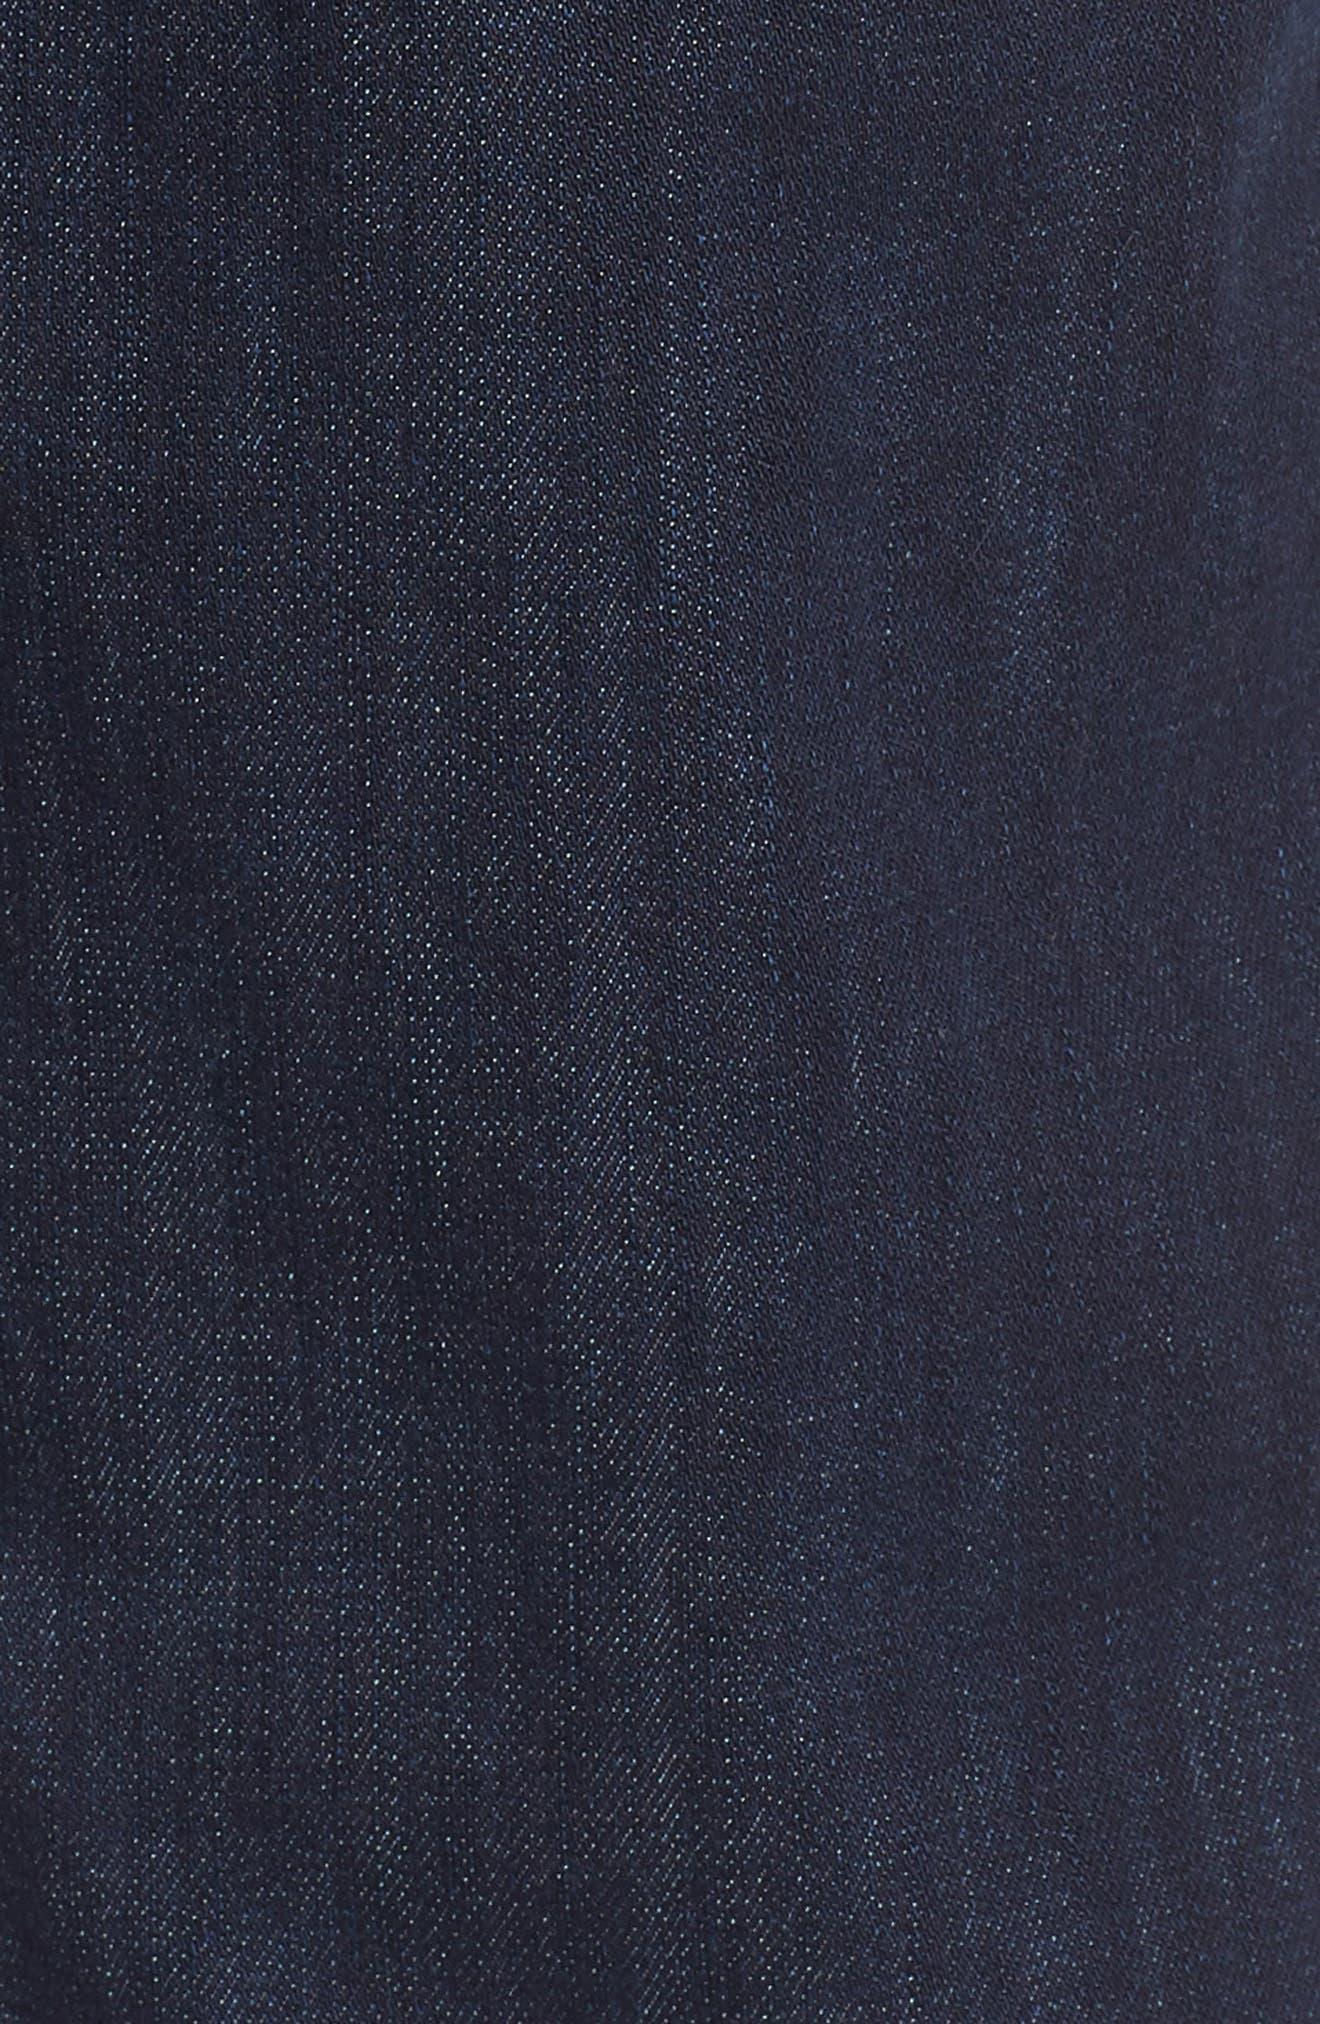 Masterpiece Regular Jeans,                             Alternate thumbnail 14, color,